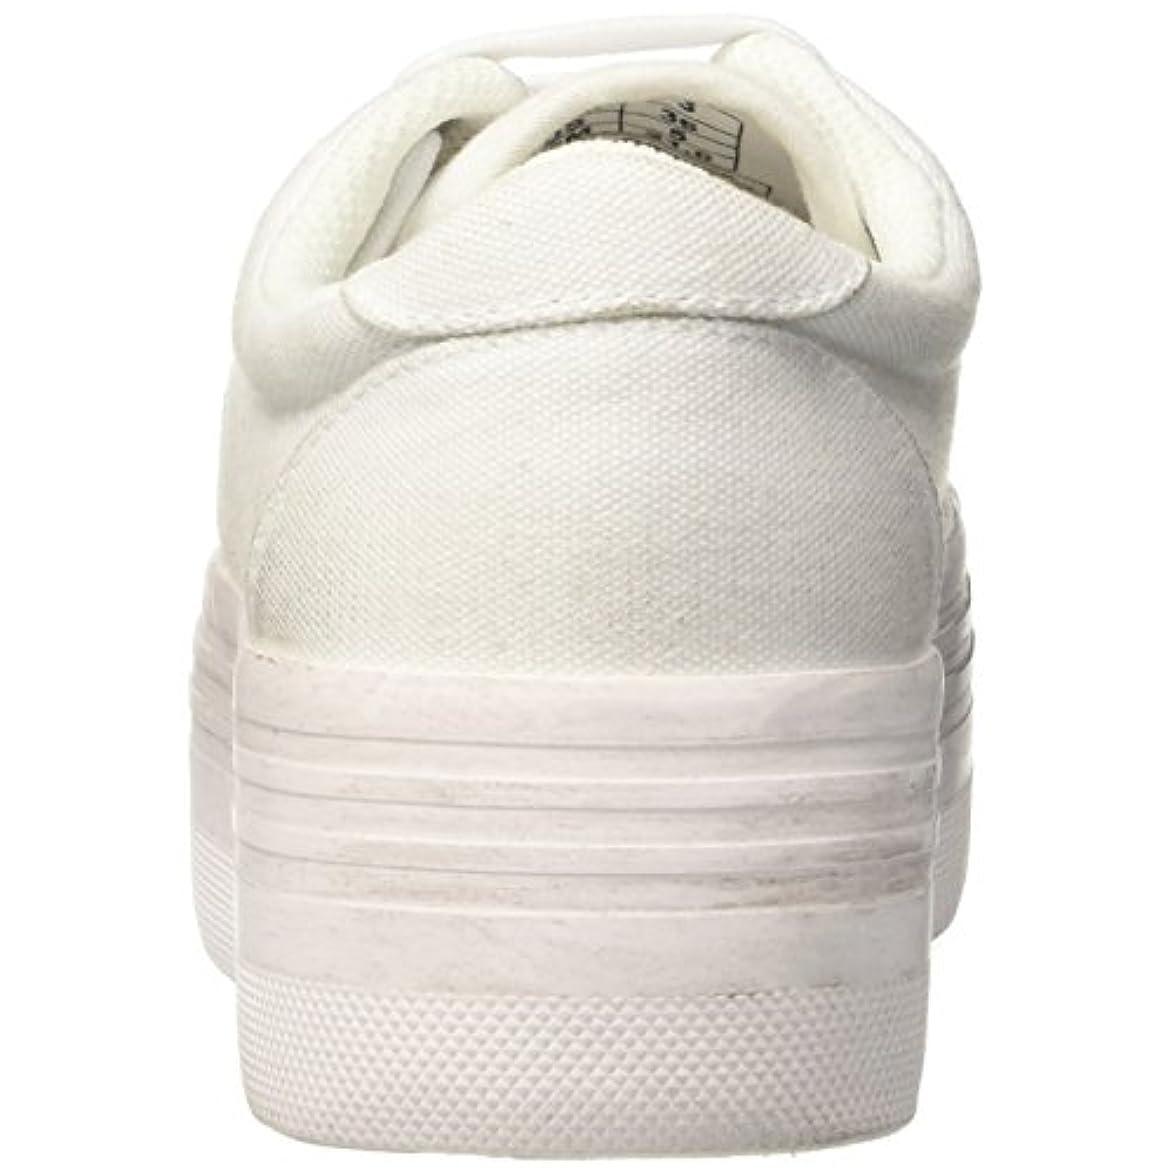 Jeffrey Campbell Zomg Jcpzomgcanwash-white Scarpe Indoor Multisport Donna